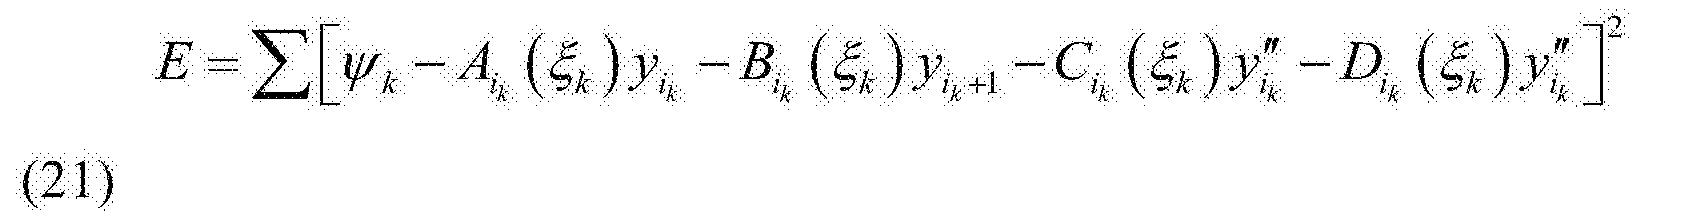 Figure CN107303402AD00493